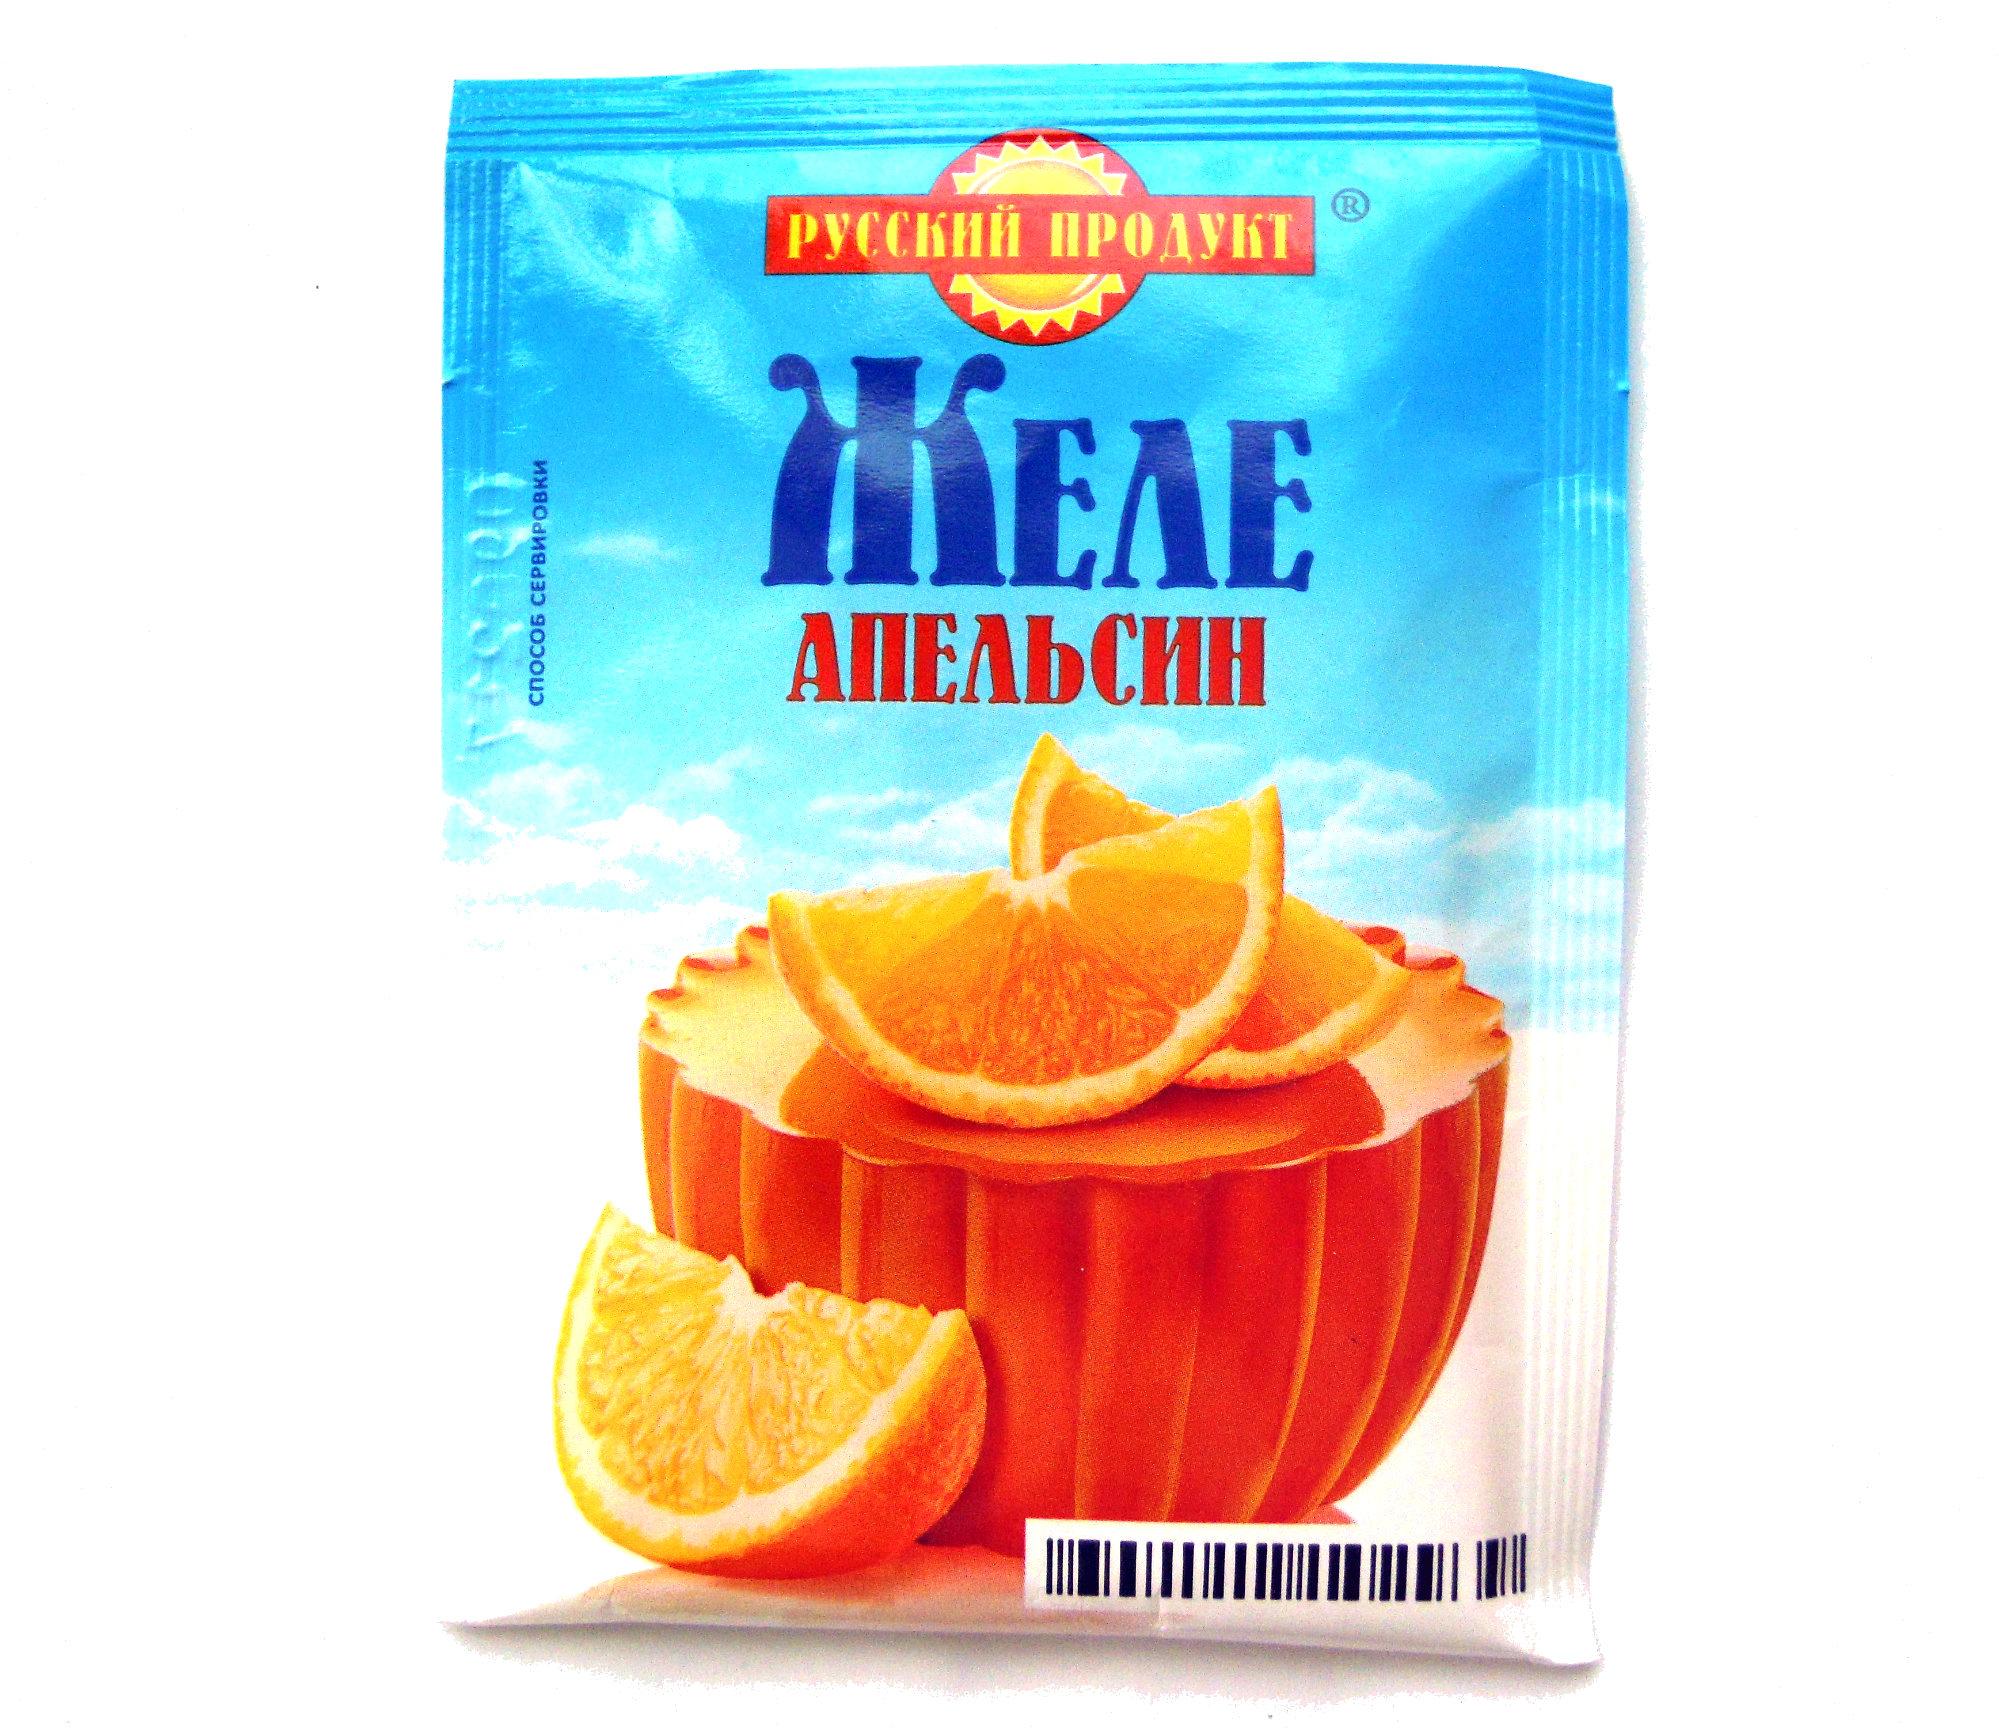 Желе Апельсин - Produkt - ru